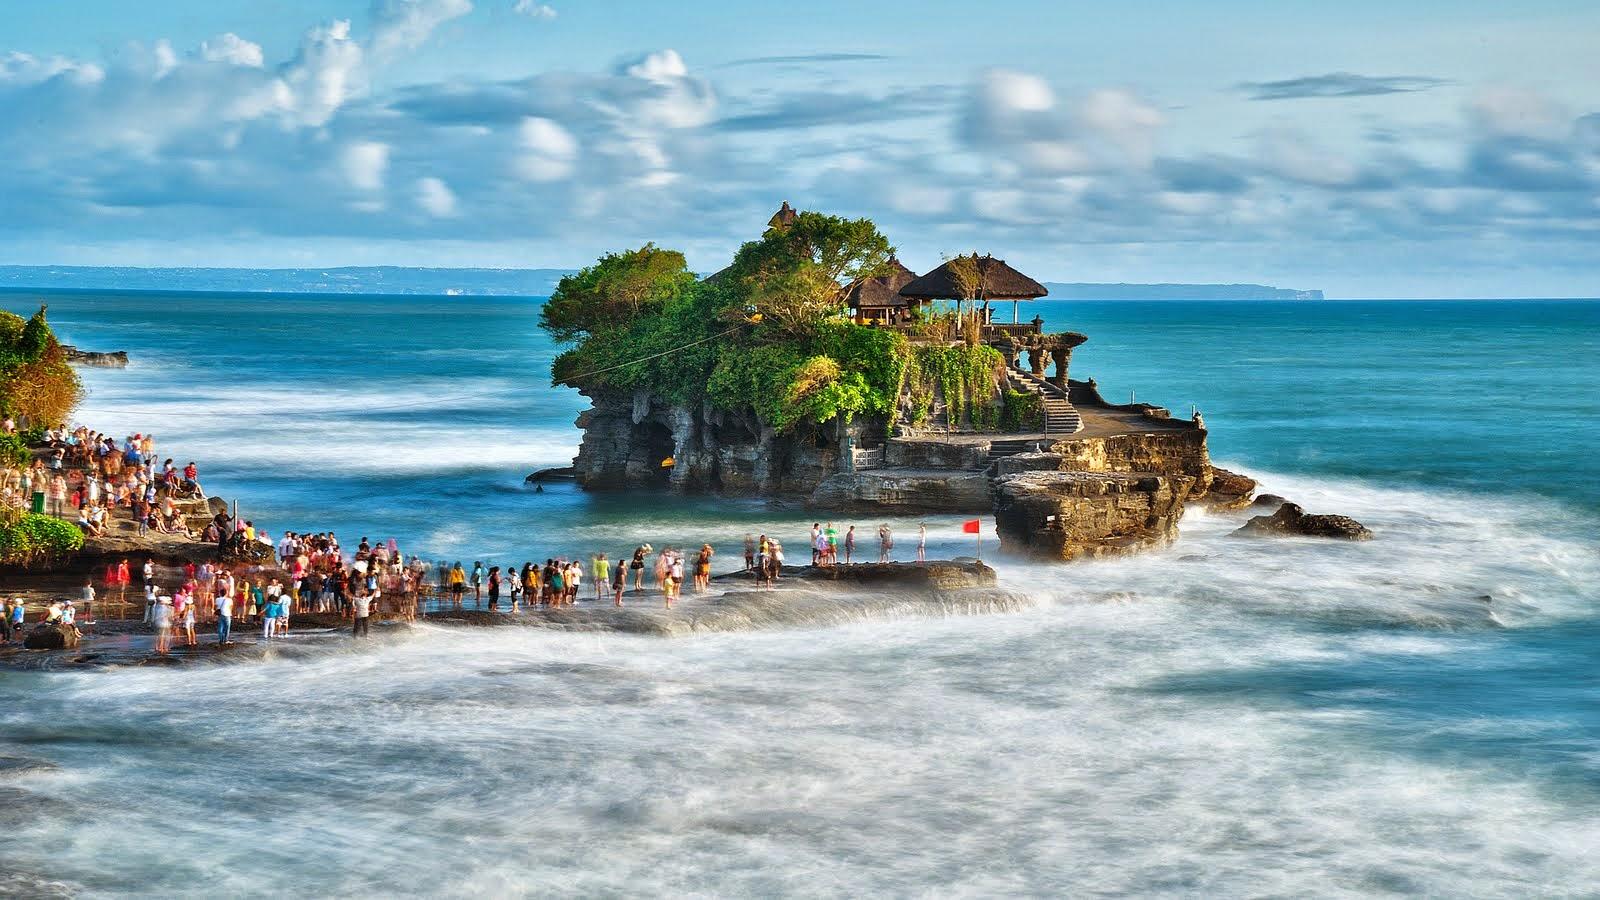 Alam Wisata Bali Tanah Lot Bali Alam Wisata Bali